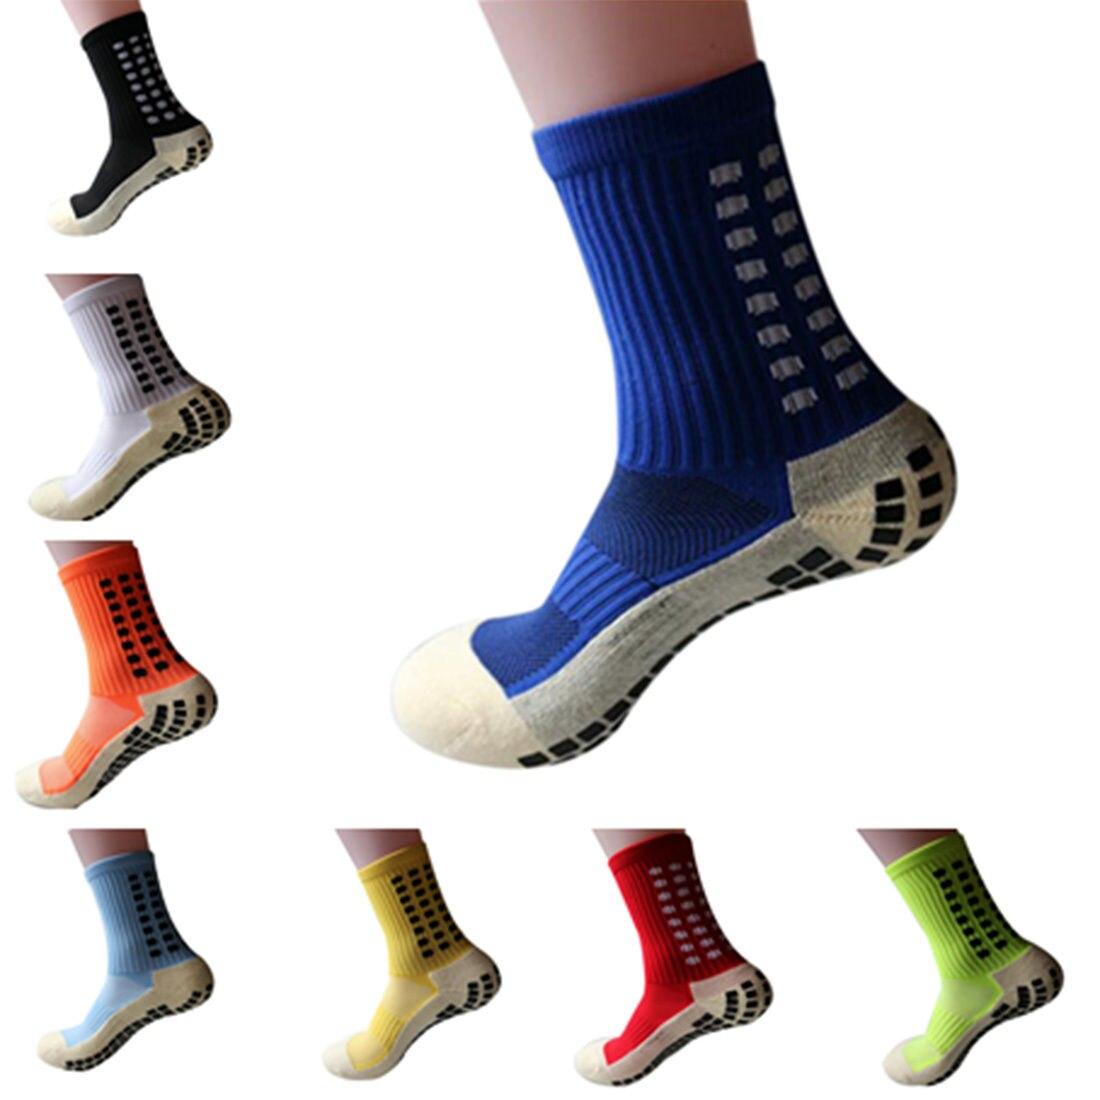 New Unisex Anti Slip Soccer Cotton Football Running Sport Socks Absorb Sweat